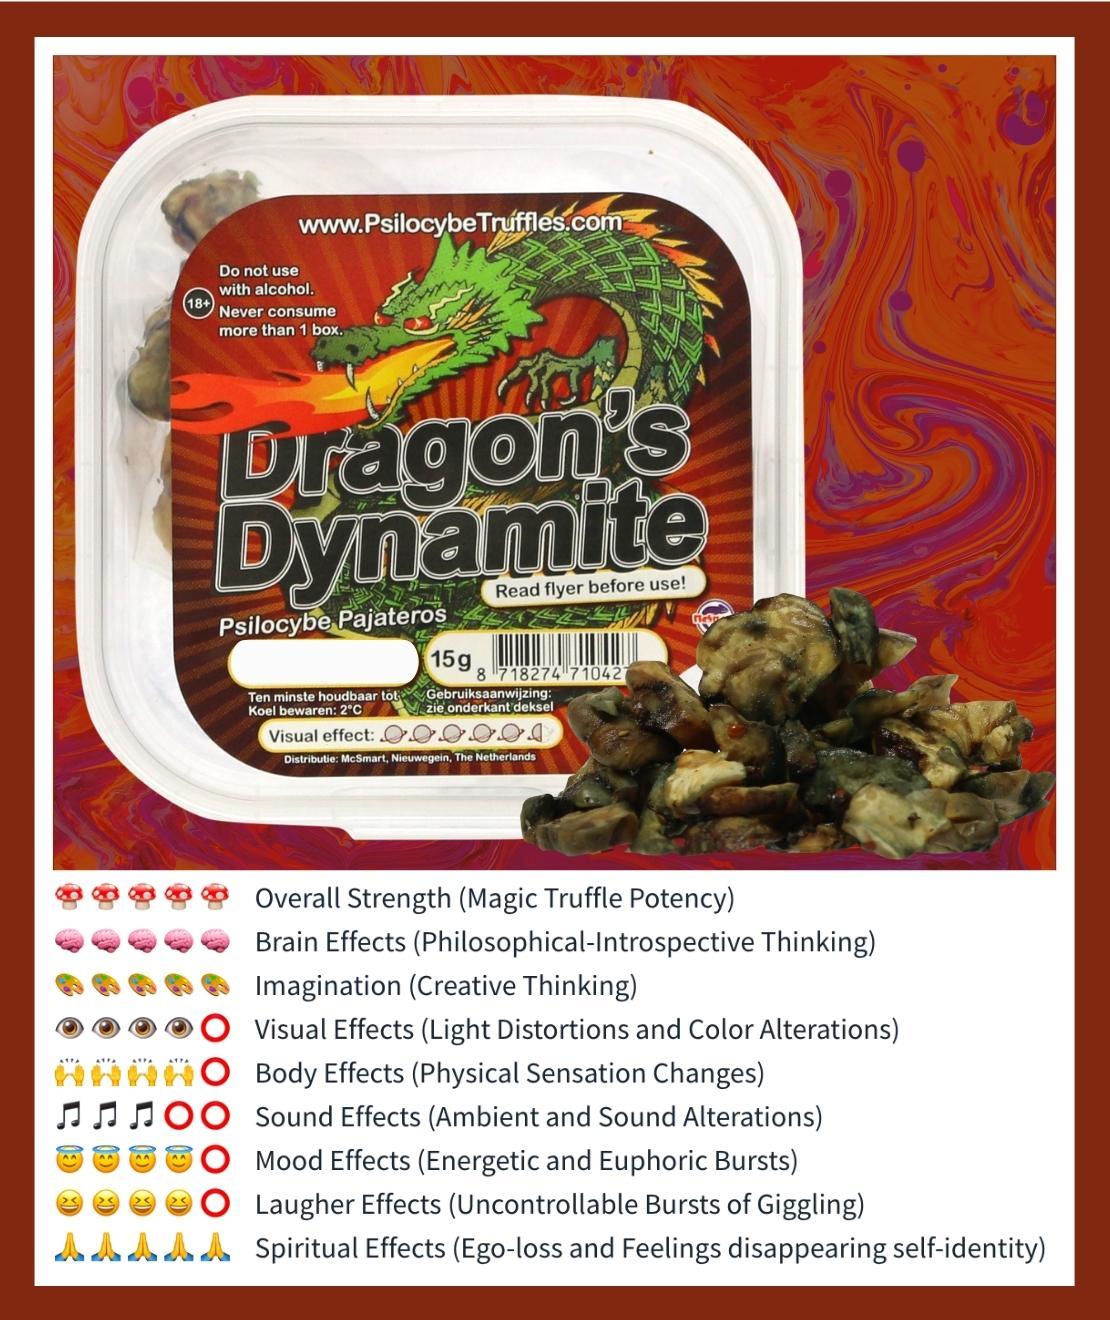 Dragon's Dynamite Magic Truffles strength chart